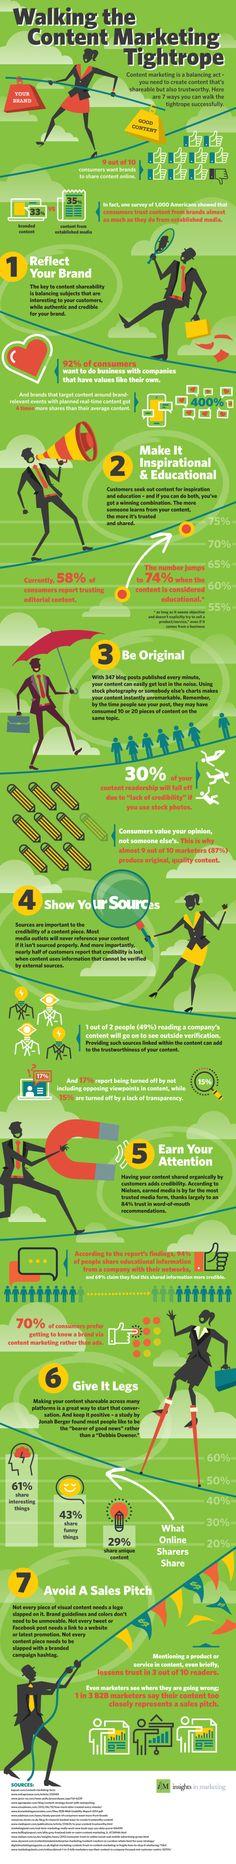 Content Marketing Basics 7 Steps to Shareworthy and Trustworthy Content #ContentMarketing #Business